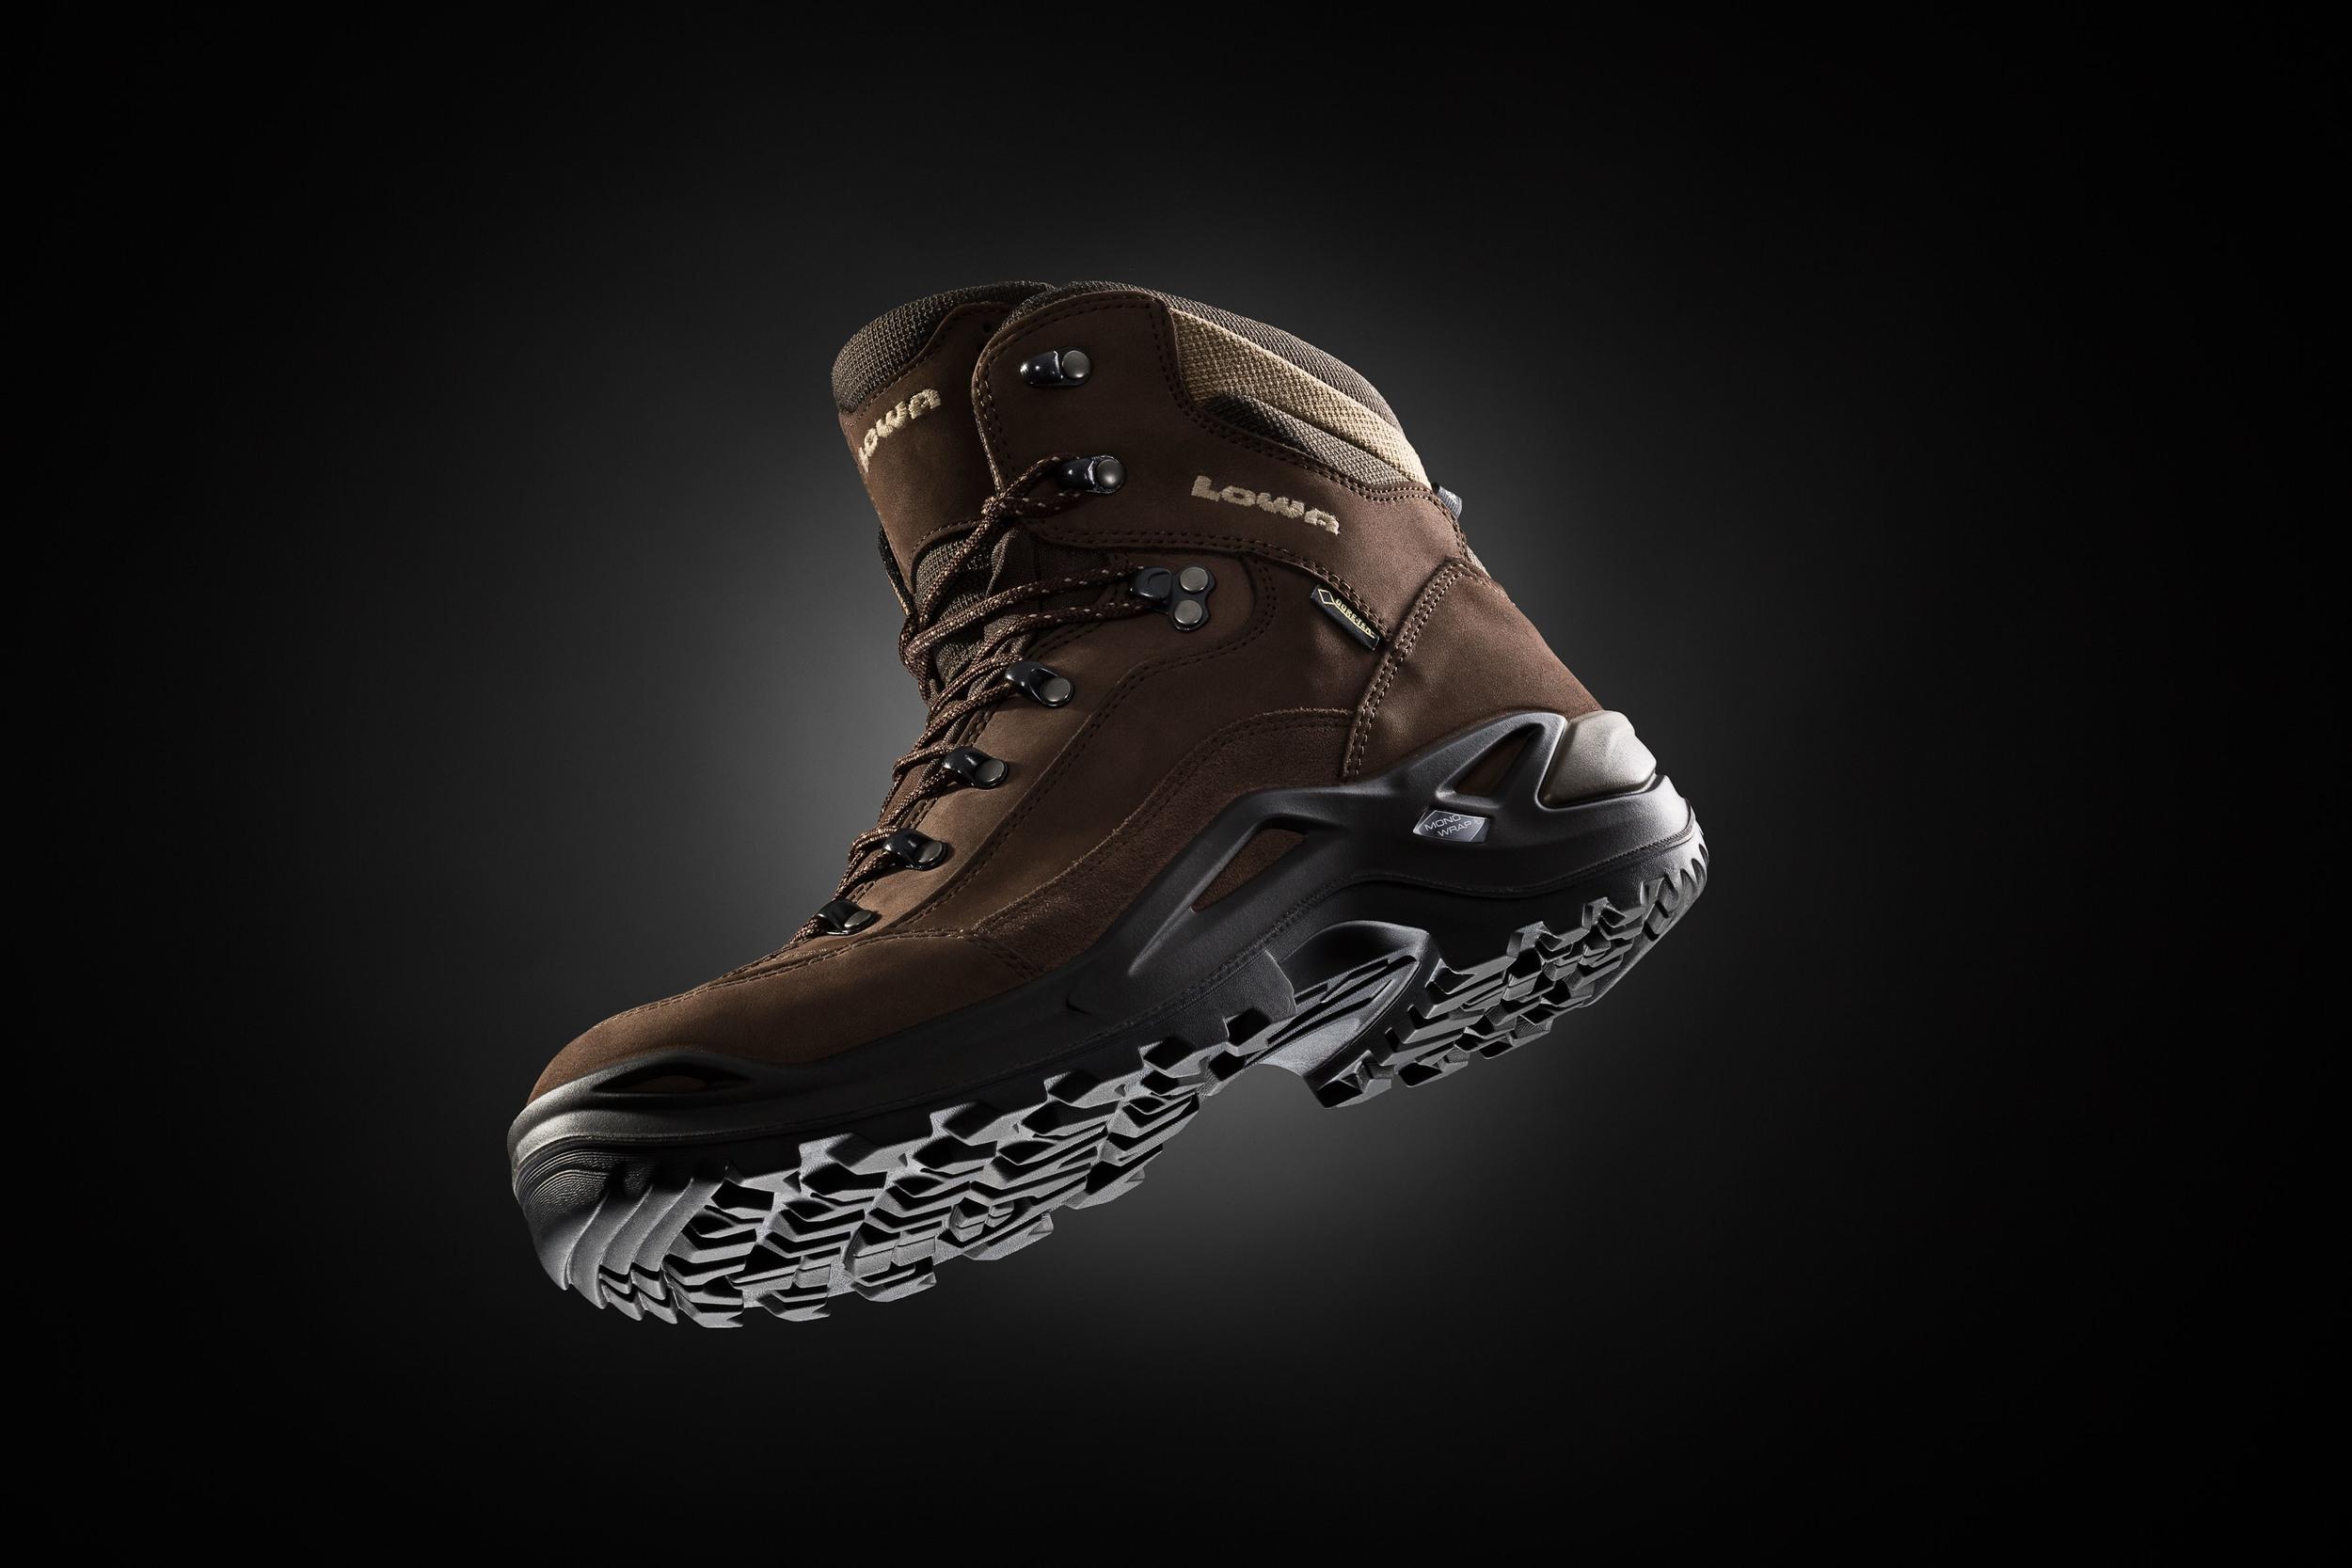 boots-8_Web_2400px.jpg